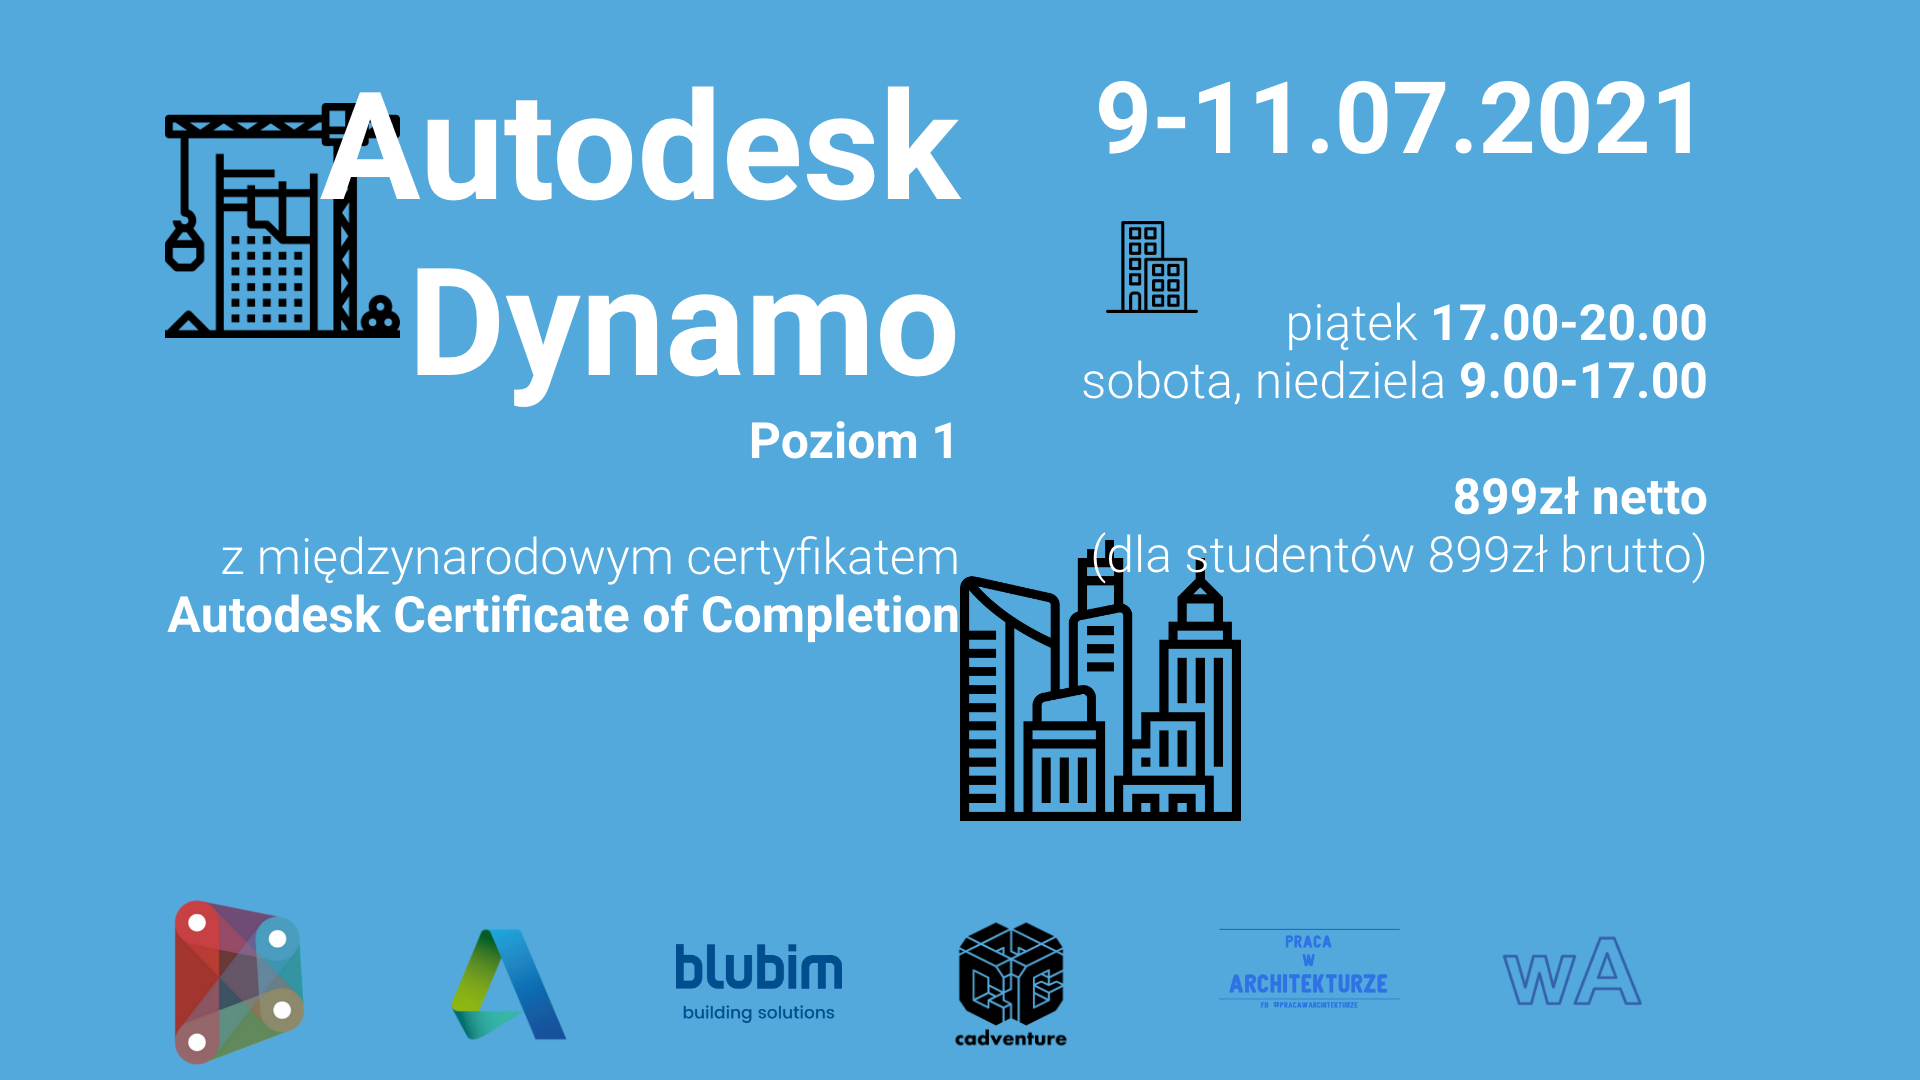 Dynamo 9-11.07.2021